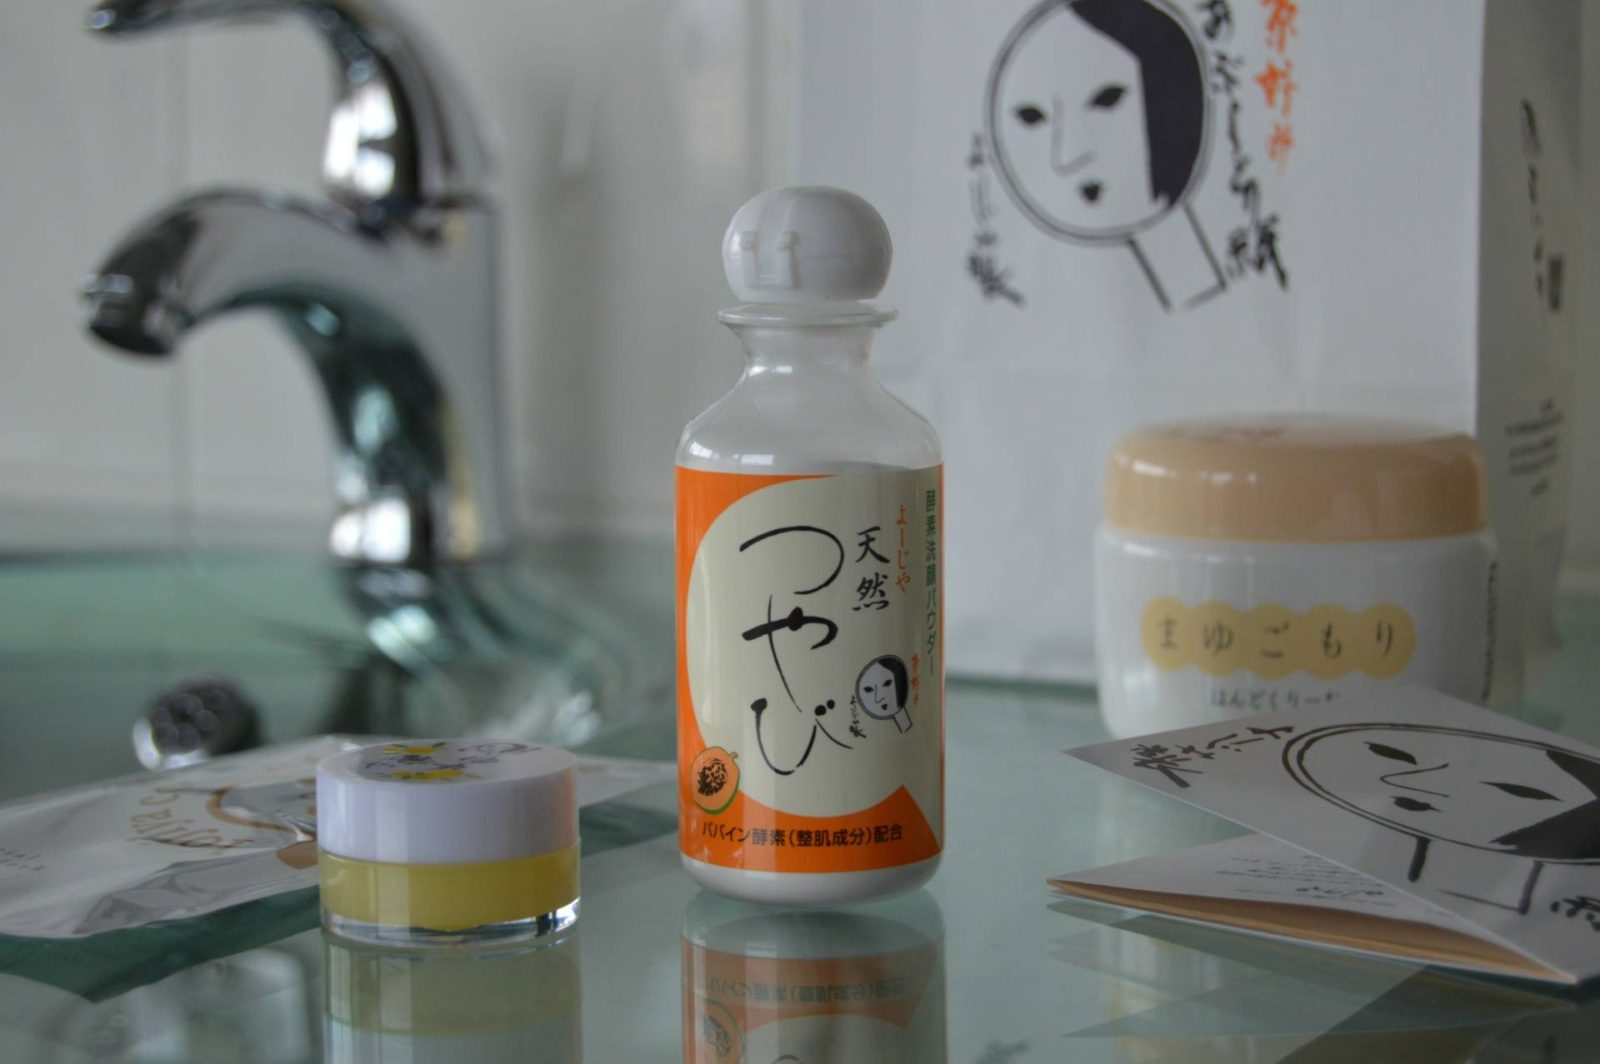 Yojiya Face Washing Powder – My Best Beauty Find in Kyoto, Japan